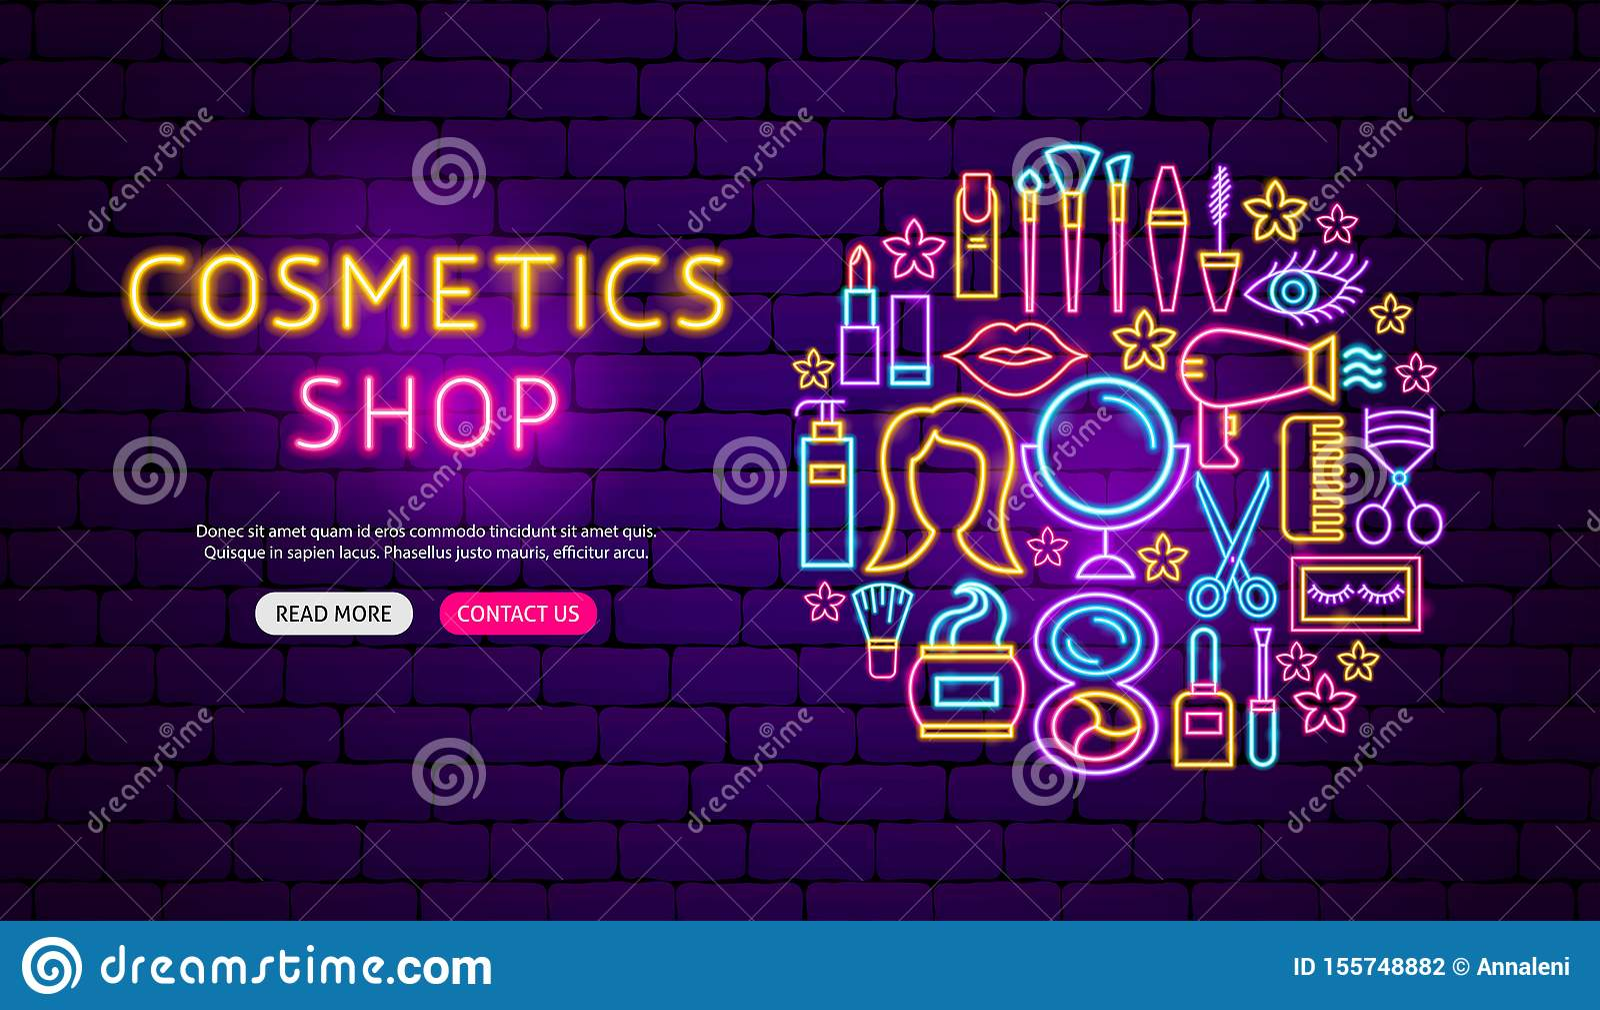 Cosmetics Shop Neon Banner Design Stock Vector Illustration Of Glow Banner 155748882